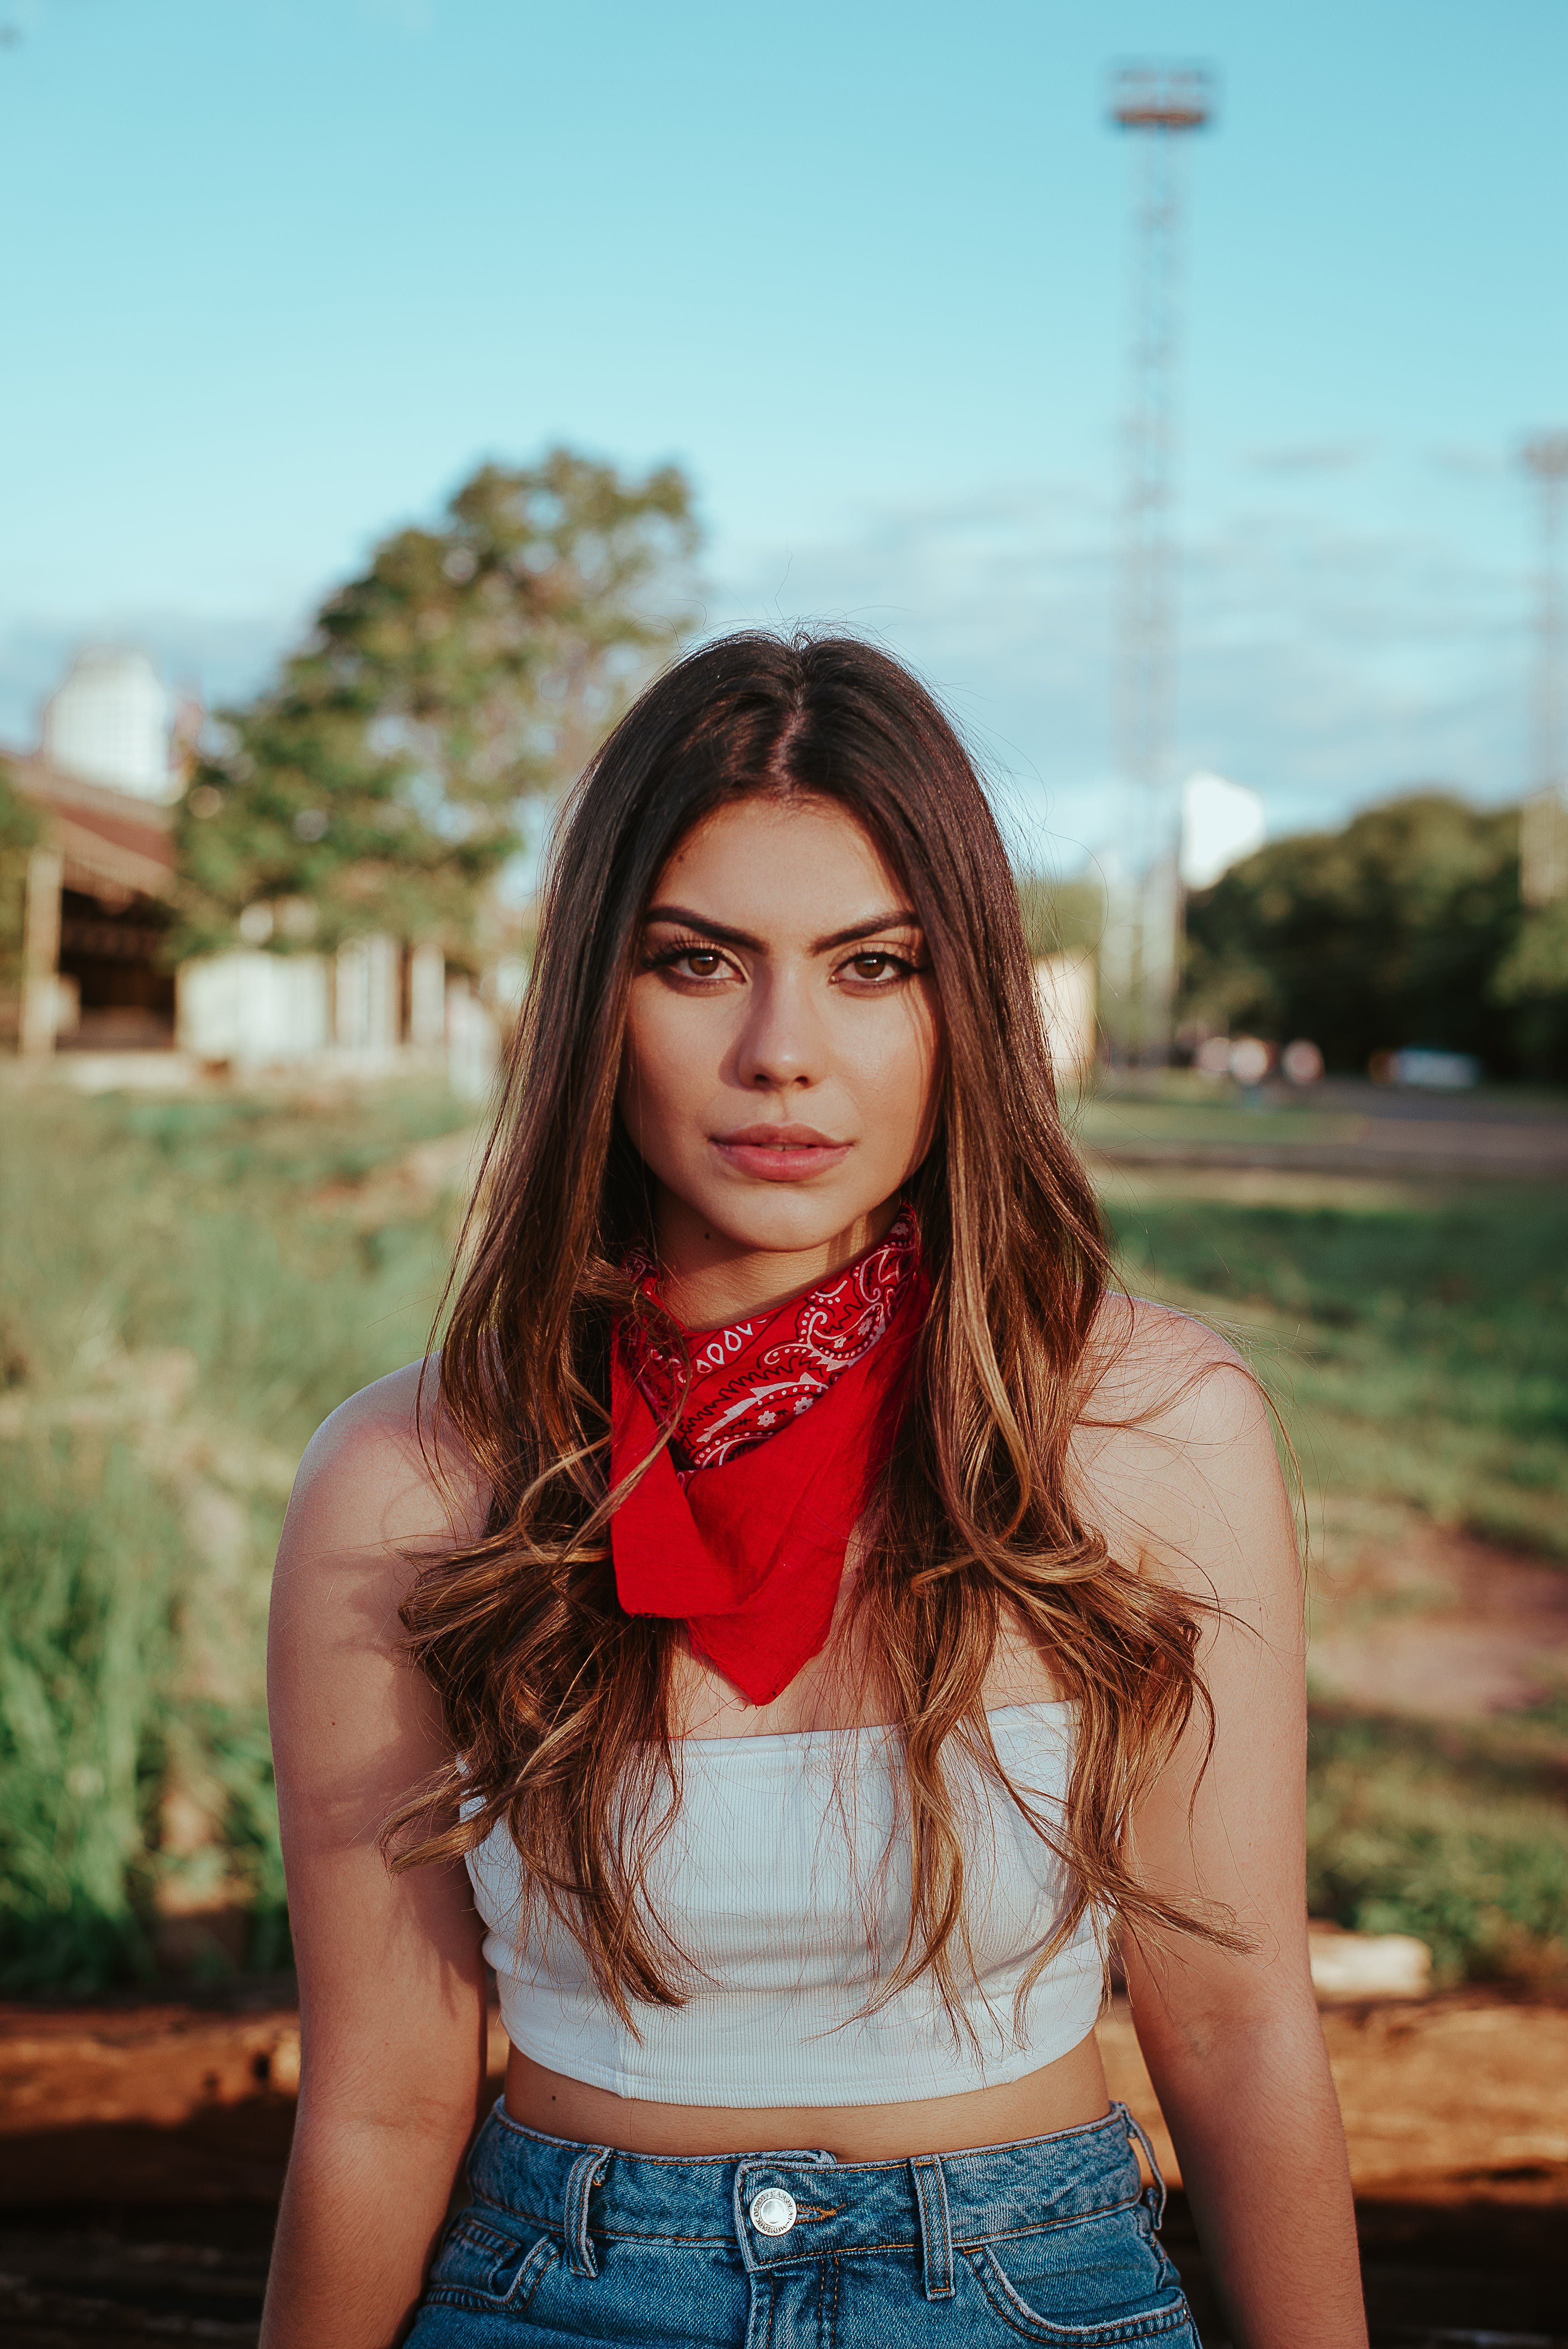 Woman Wearing White Crop Top, Blue Denim Bottoms and Red Bandana